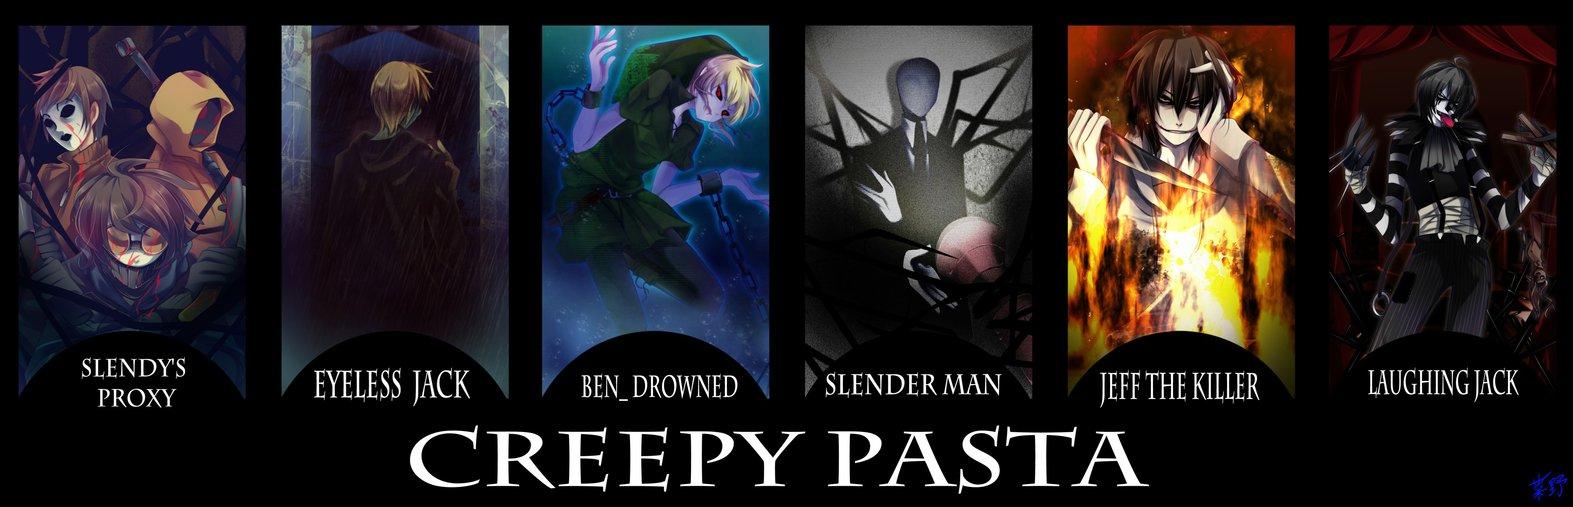 Creepypasta Boyfriend Scenarios Maid Dress by Hazelfe 1573x507